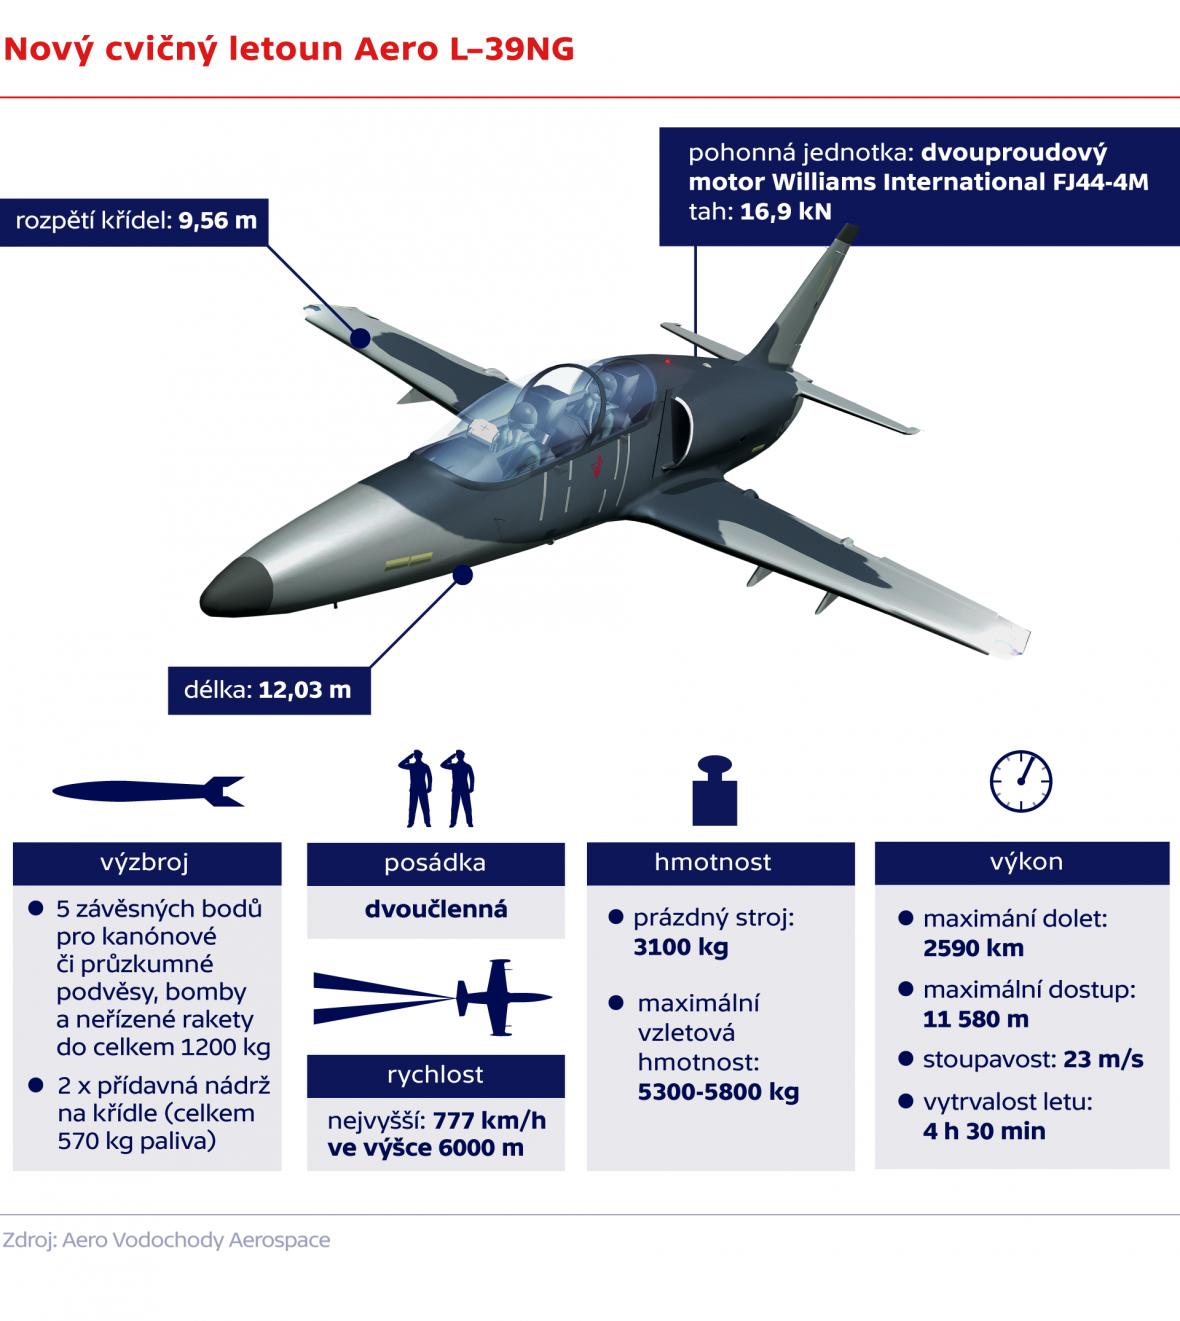 Nový cvičný letoun Aero L-39NG